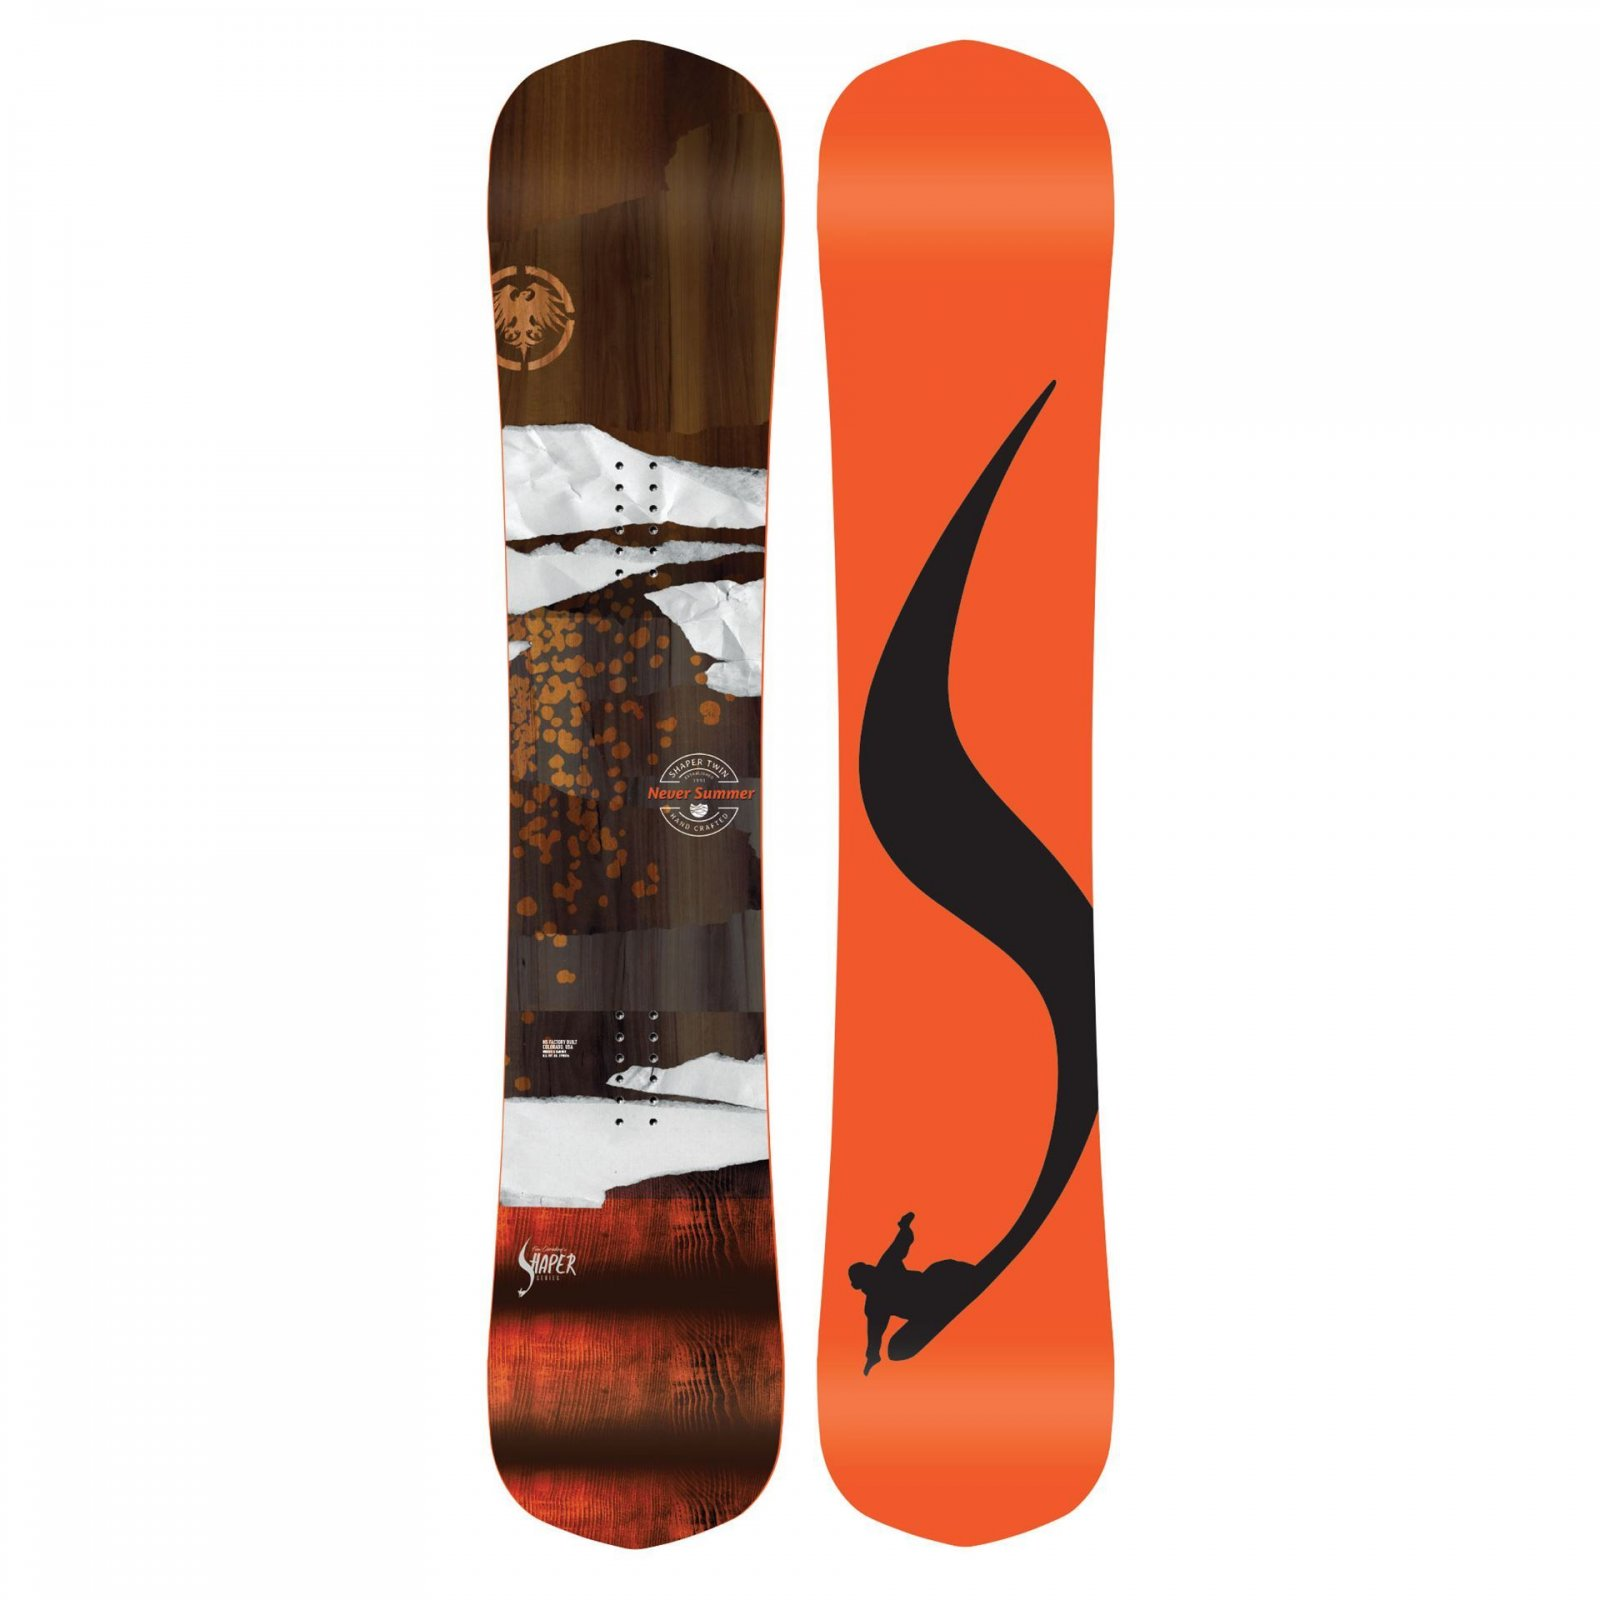 Never Summer Shaper Twin Snowboard 2020